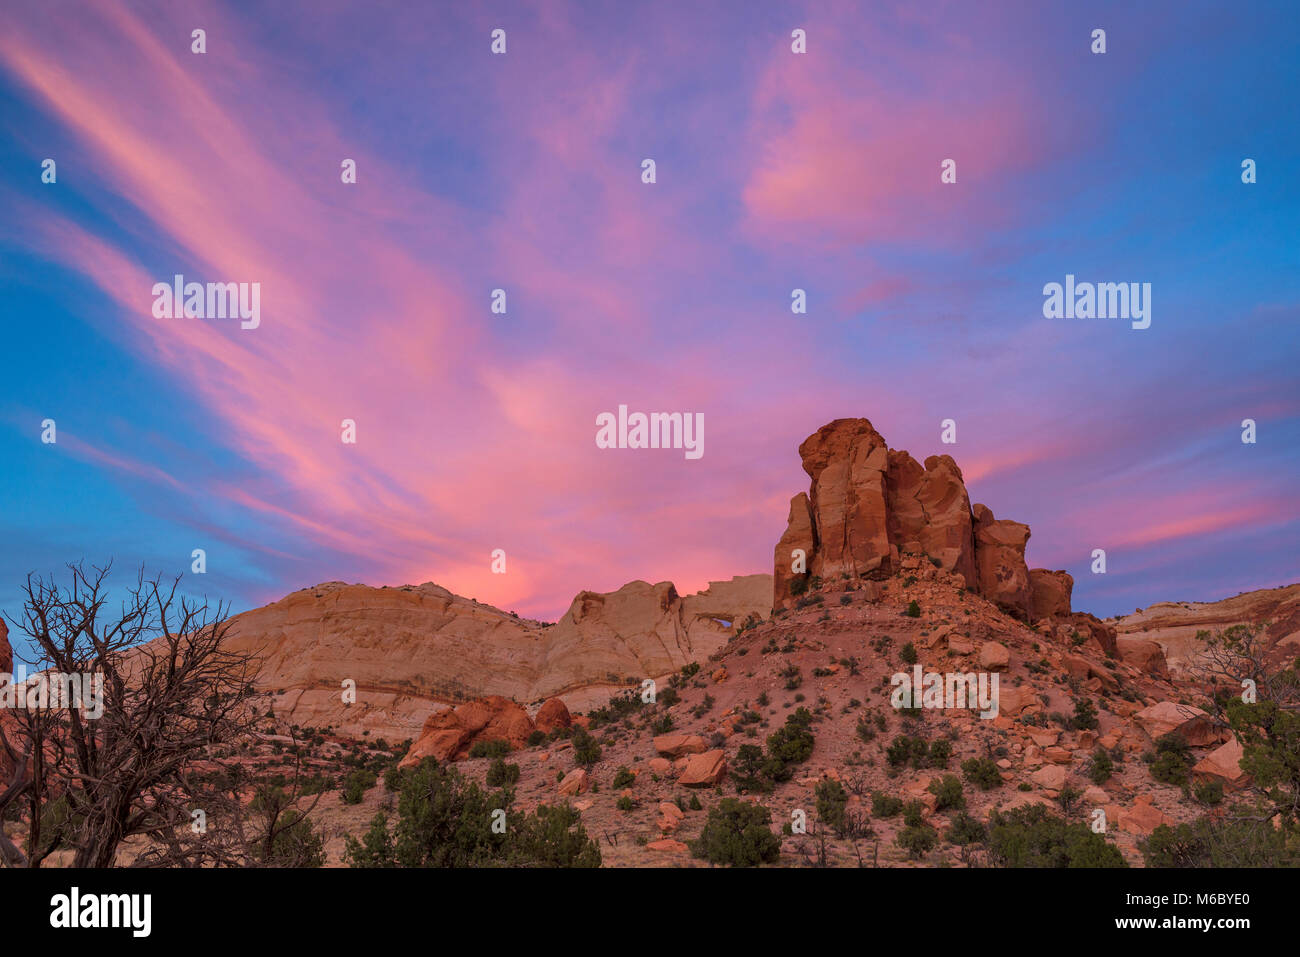 Sonnenuntergang, Muley Twist Canyon, Capitol Reef National Park, Utah Stockbild